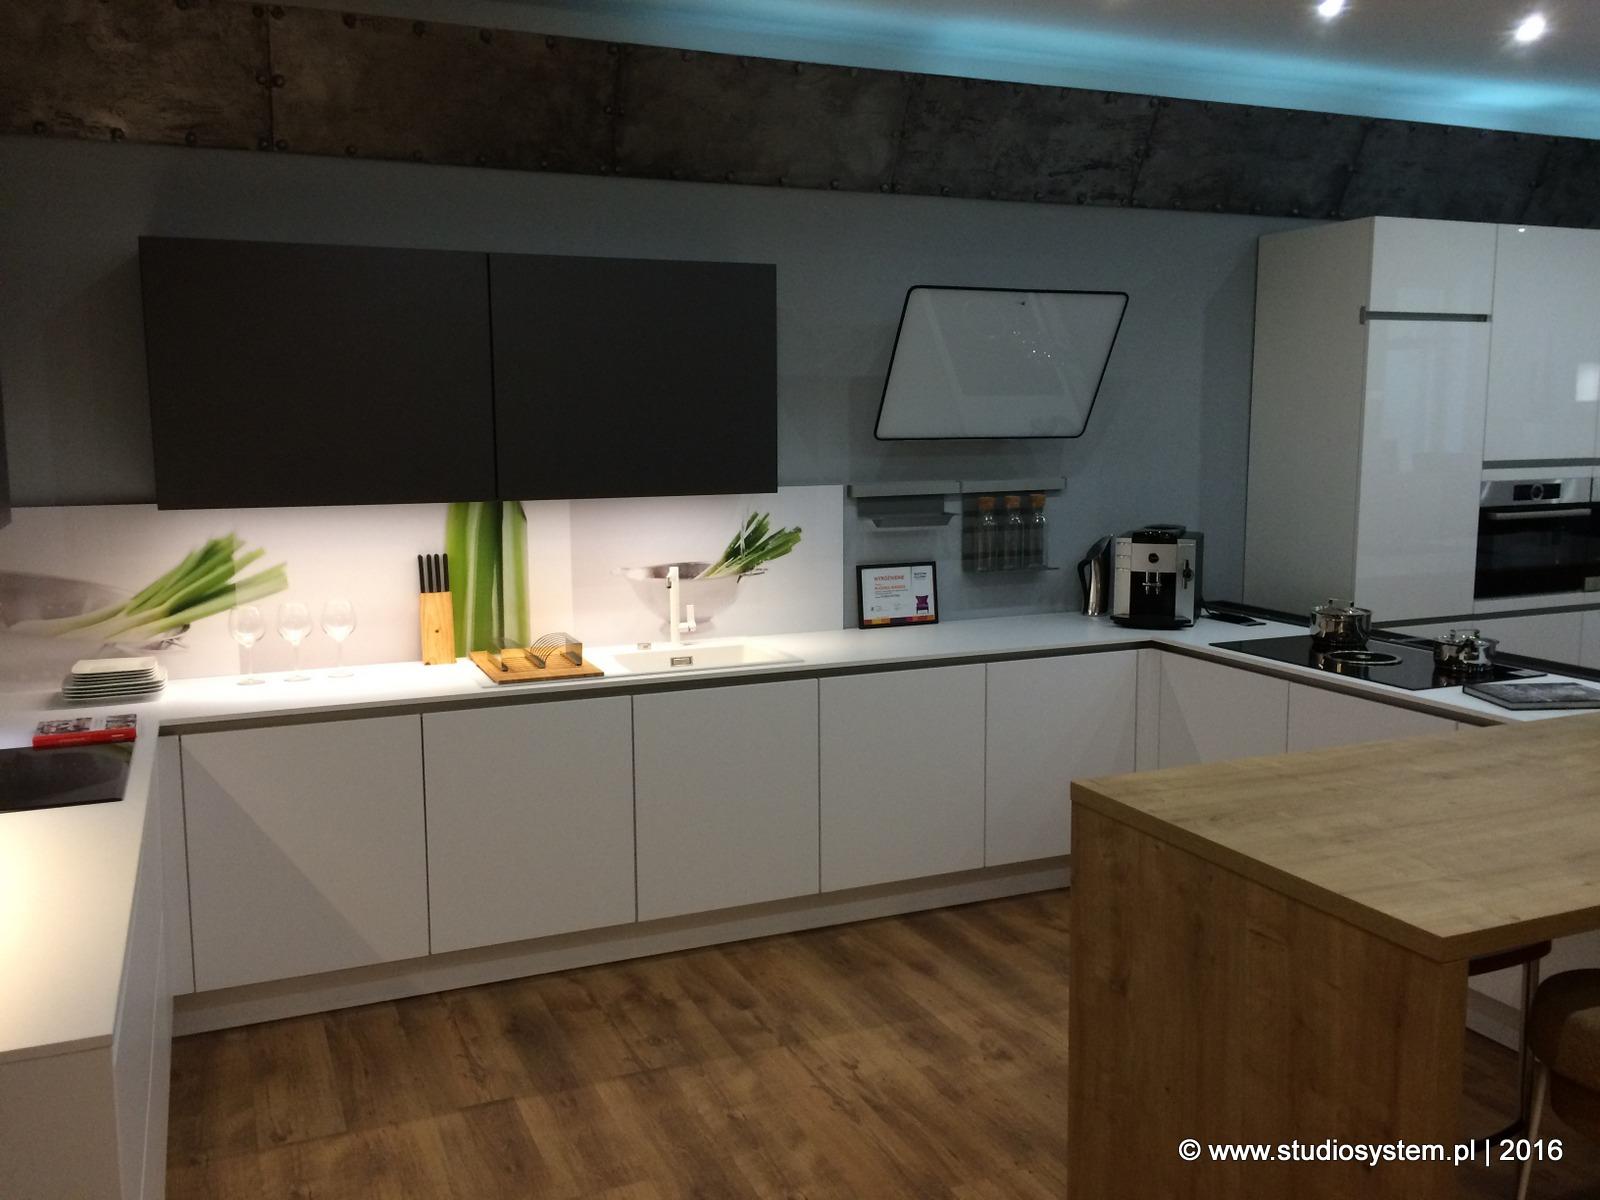 Studio System Meble Kuchenne Meble Wloskie Kuchnie Niemieckie